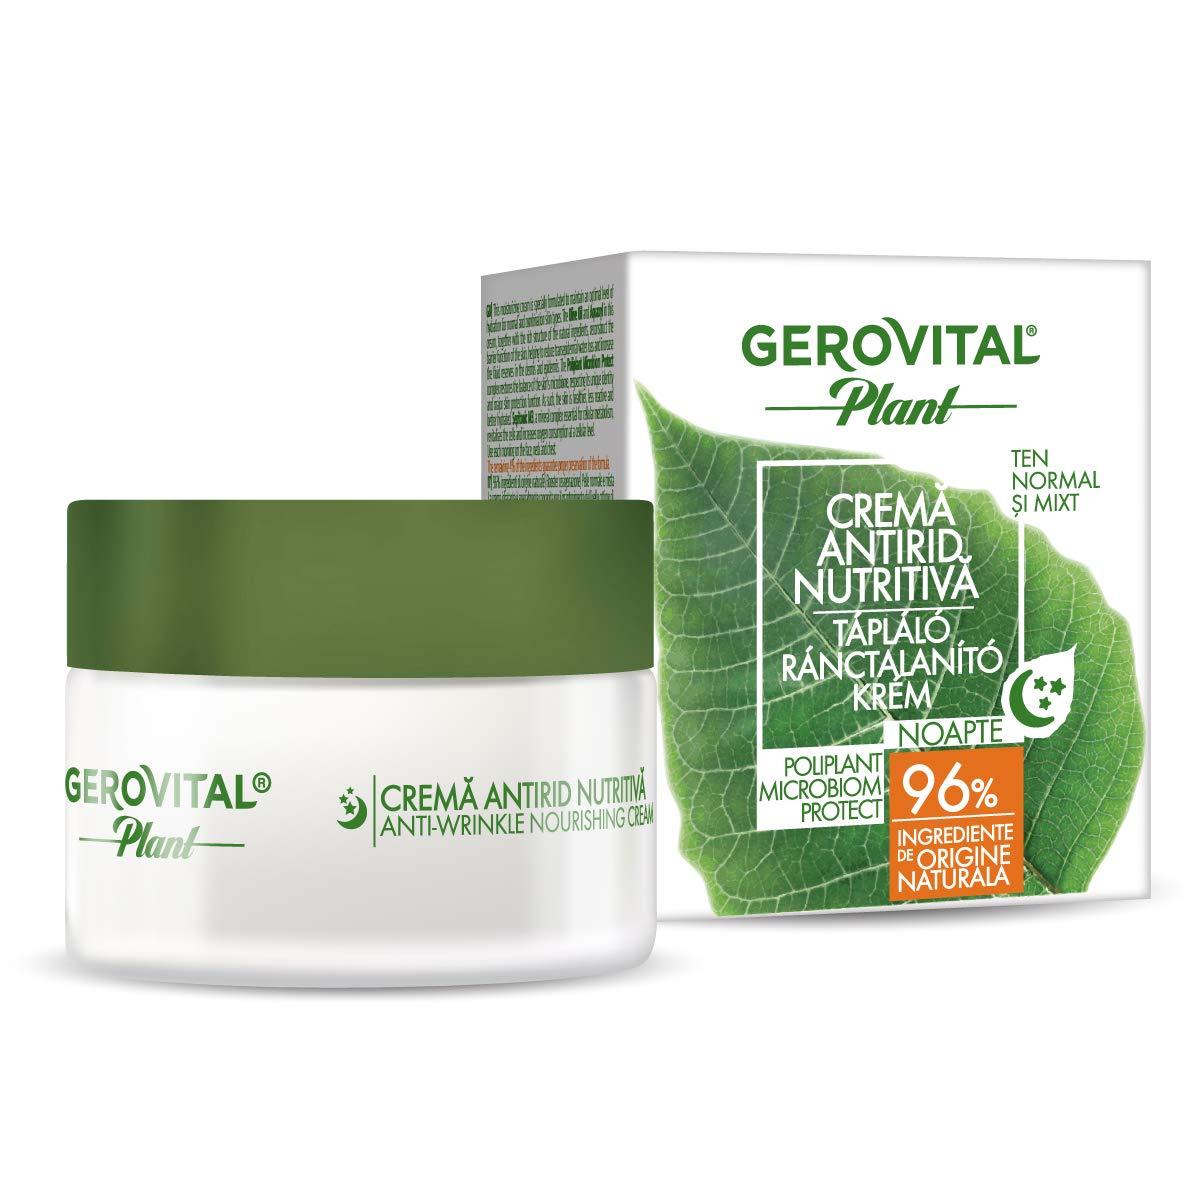 GEROVITAL PLANT ANTI-WRINKLE NOURISHING CREAM 50 ml / 1.69 fl.oz.